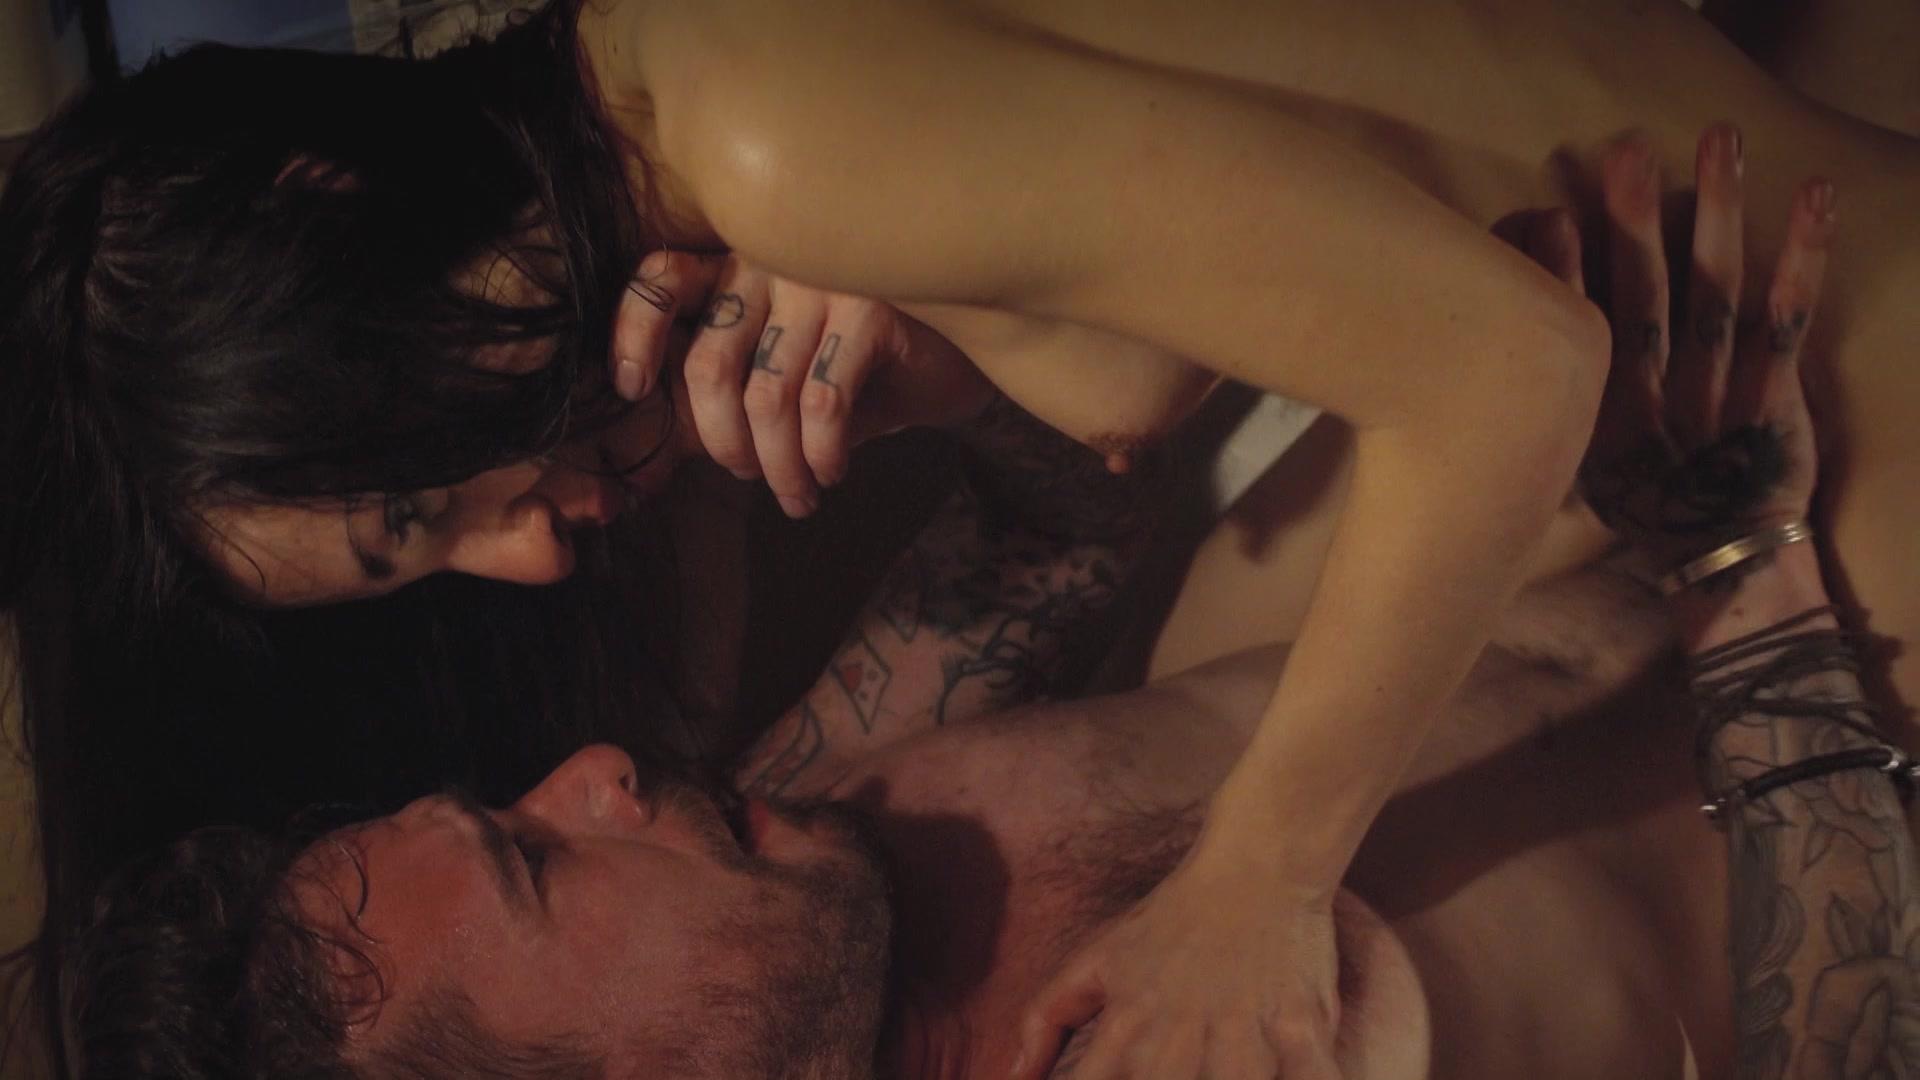 Playboy TV: XConfessions, Season 2 Ep. 5 31